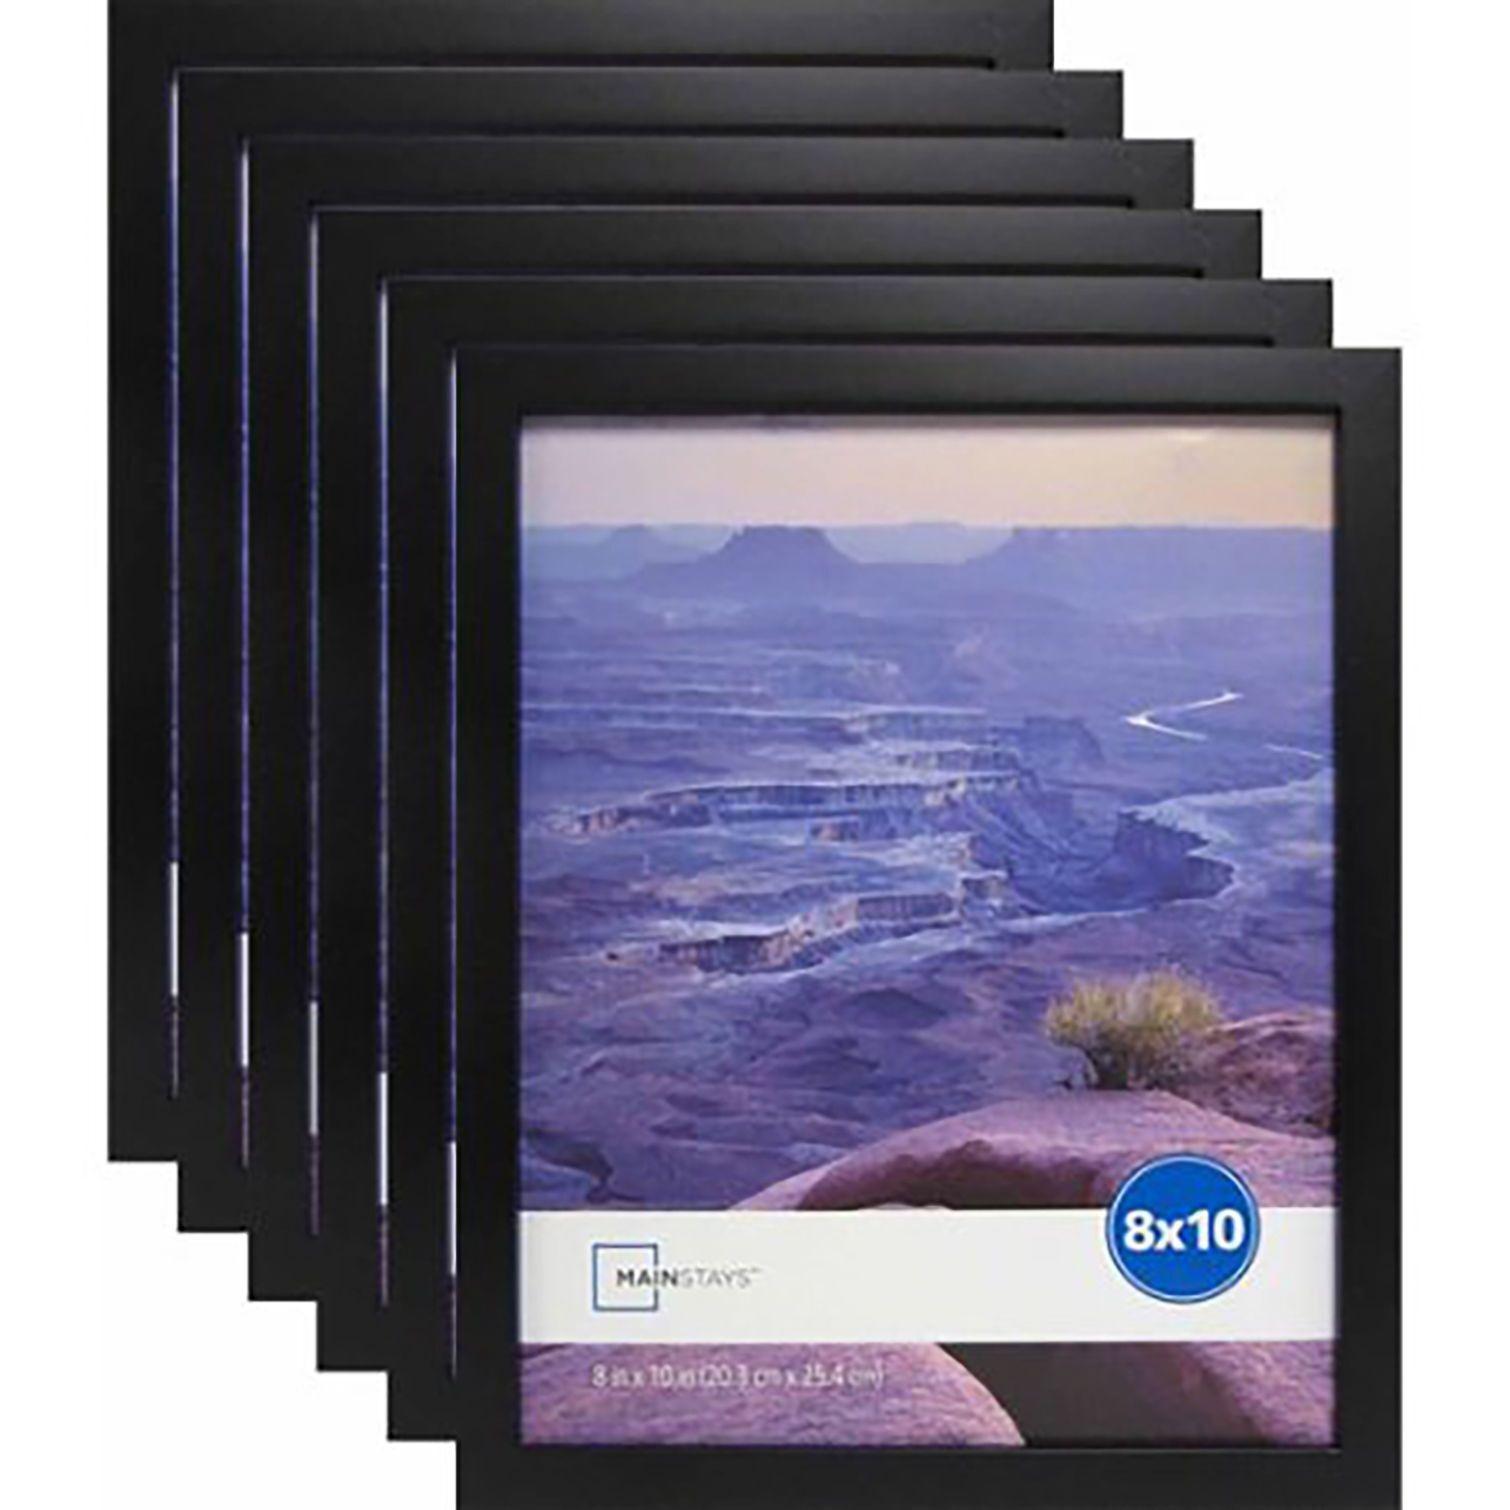 Photo frame set ebay black picture frames 8 x 10 set of 6 home decor mainstays photo linear frame jeuxipadfo Image collections